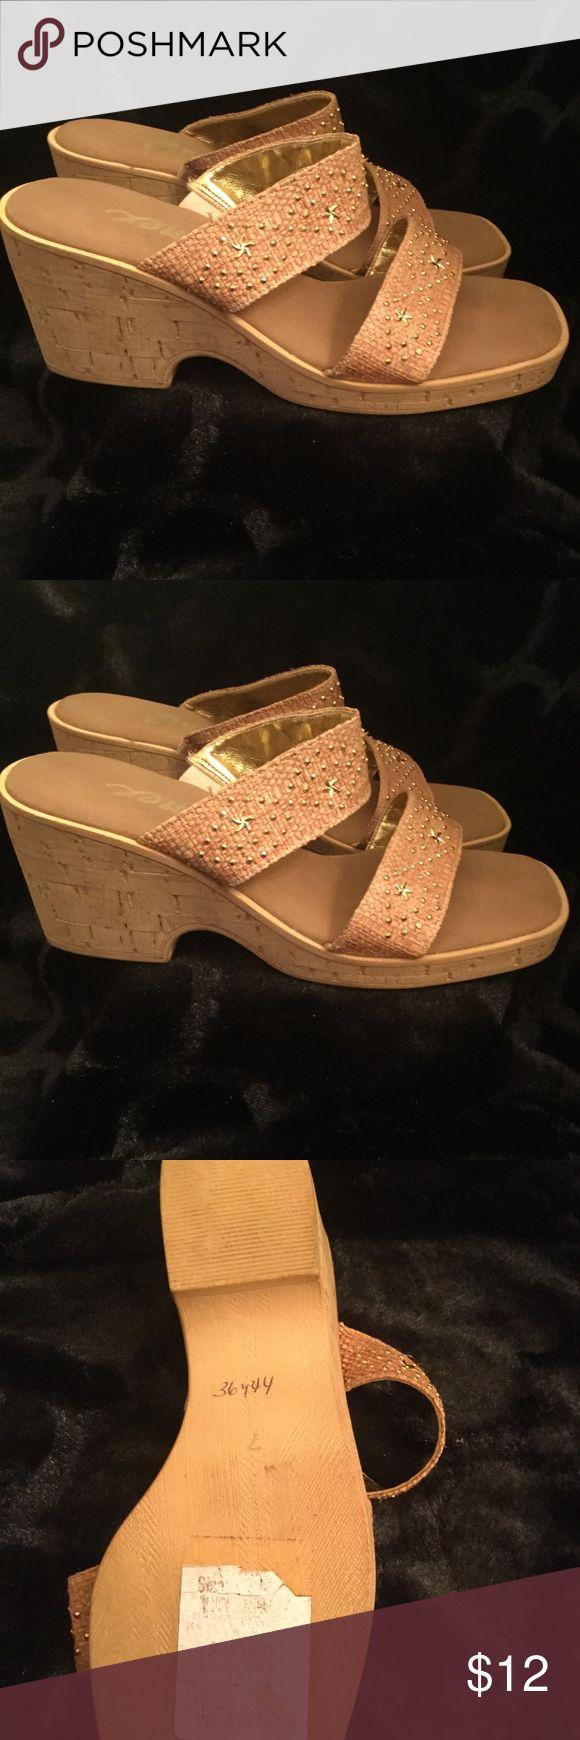 Onex Sandals Beach Onex Sandals in size 7!  Good condition. Onex Shoes Sandals